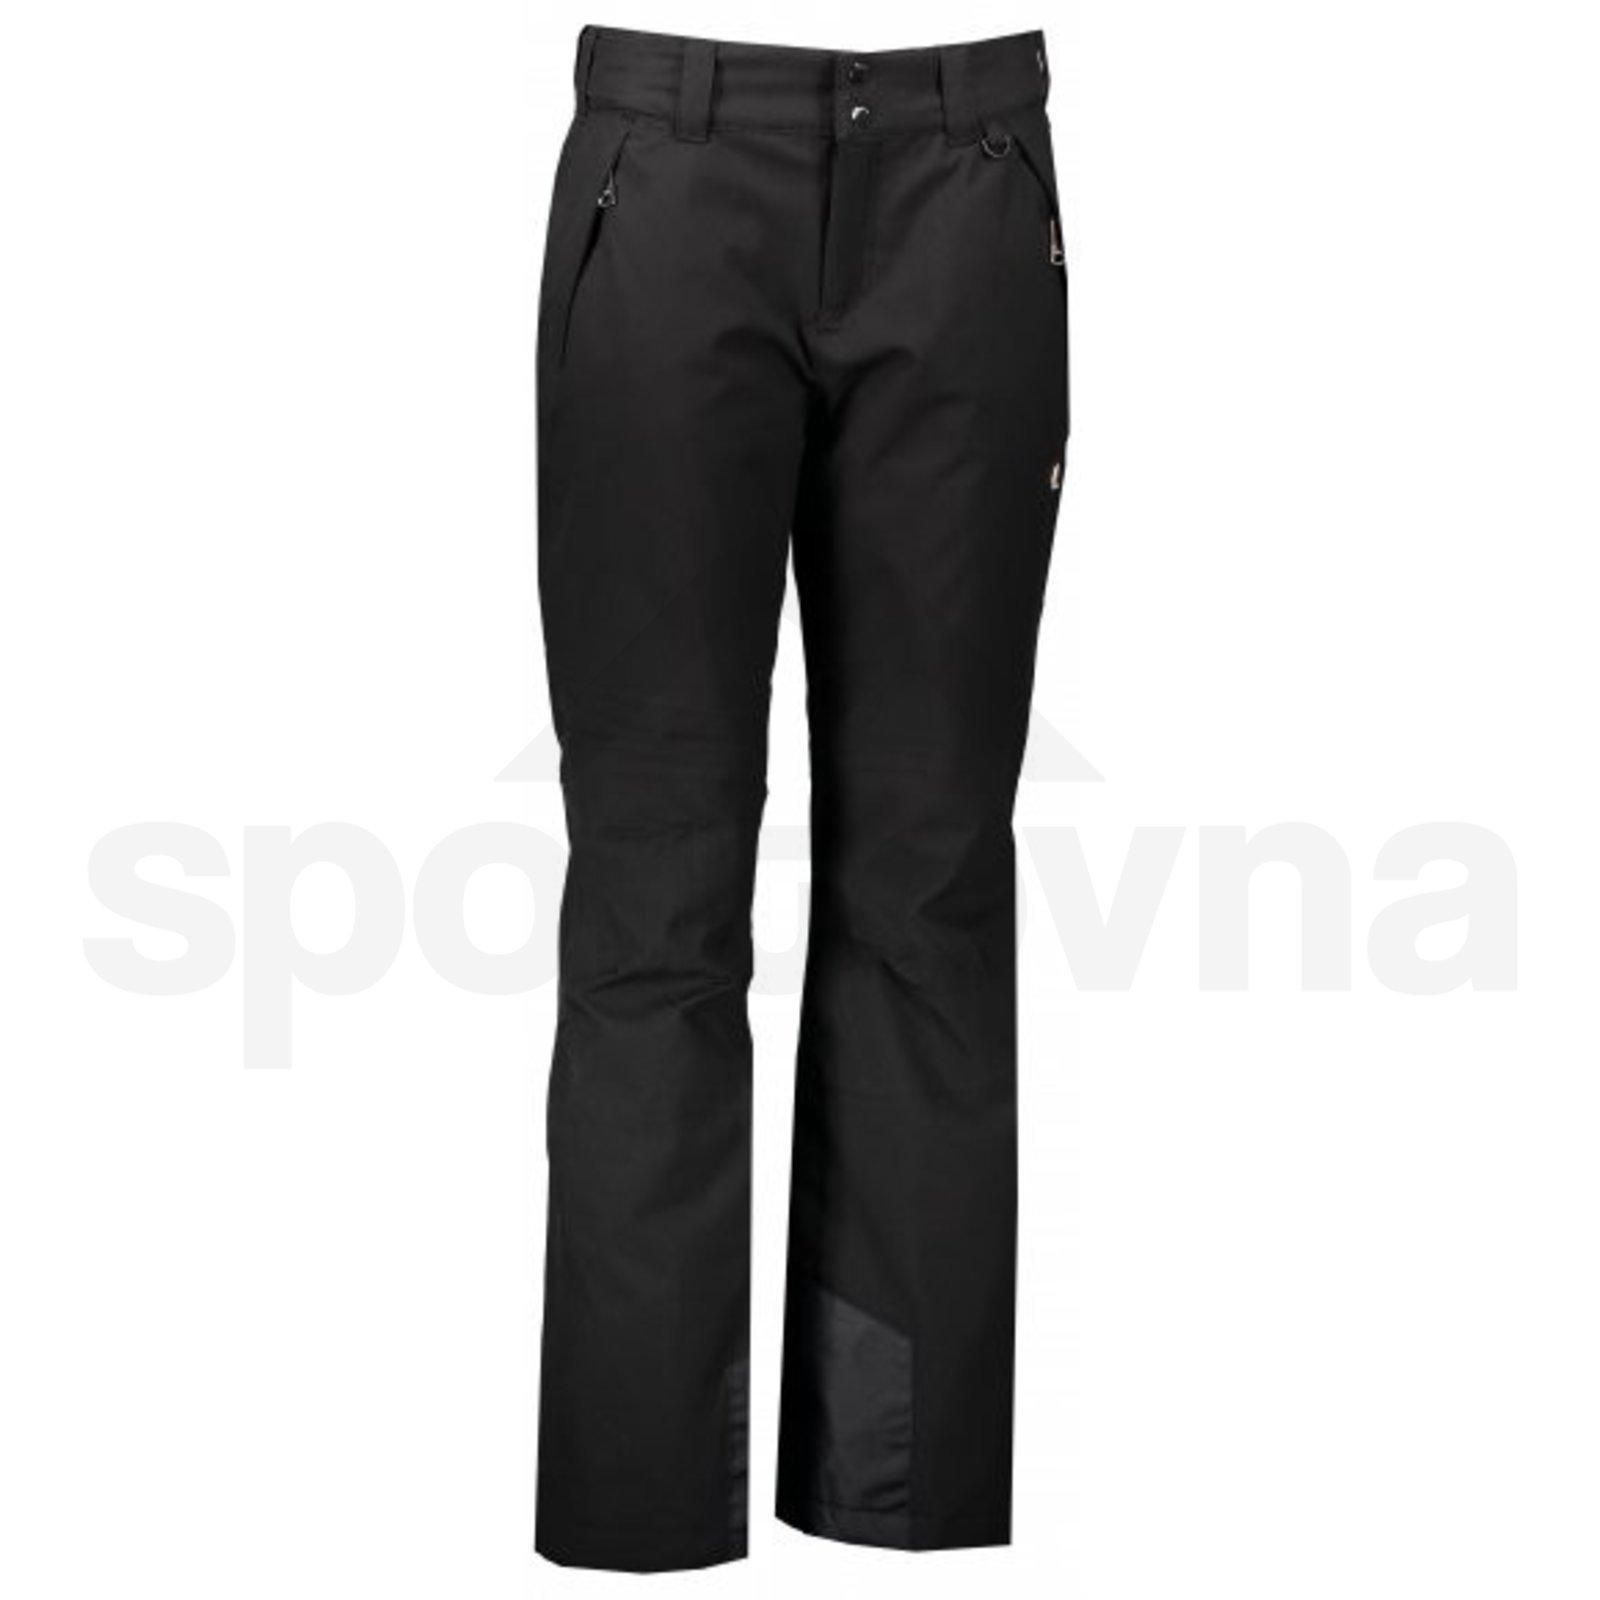 75232-kalhoty-luhta-salka